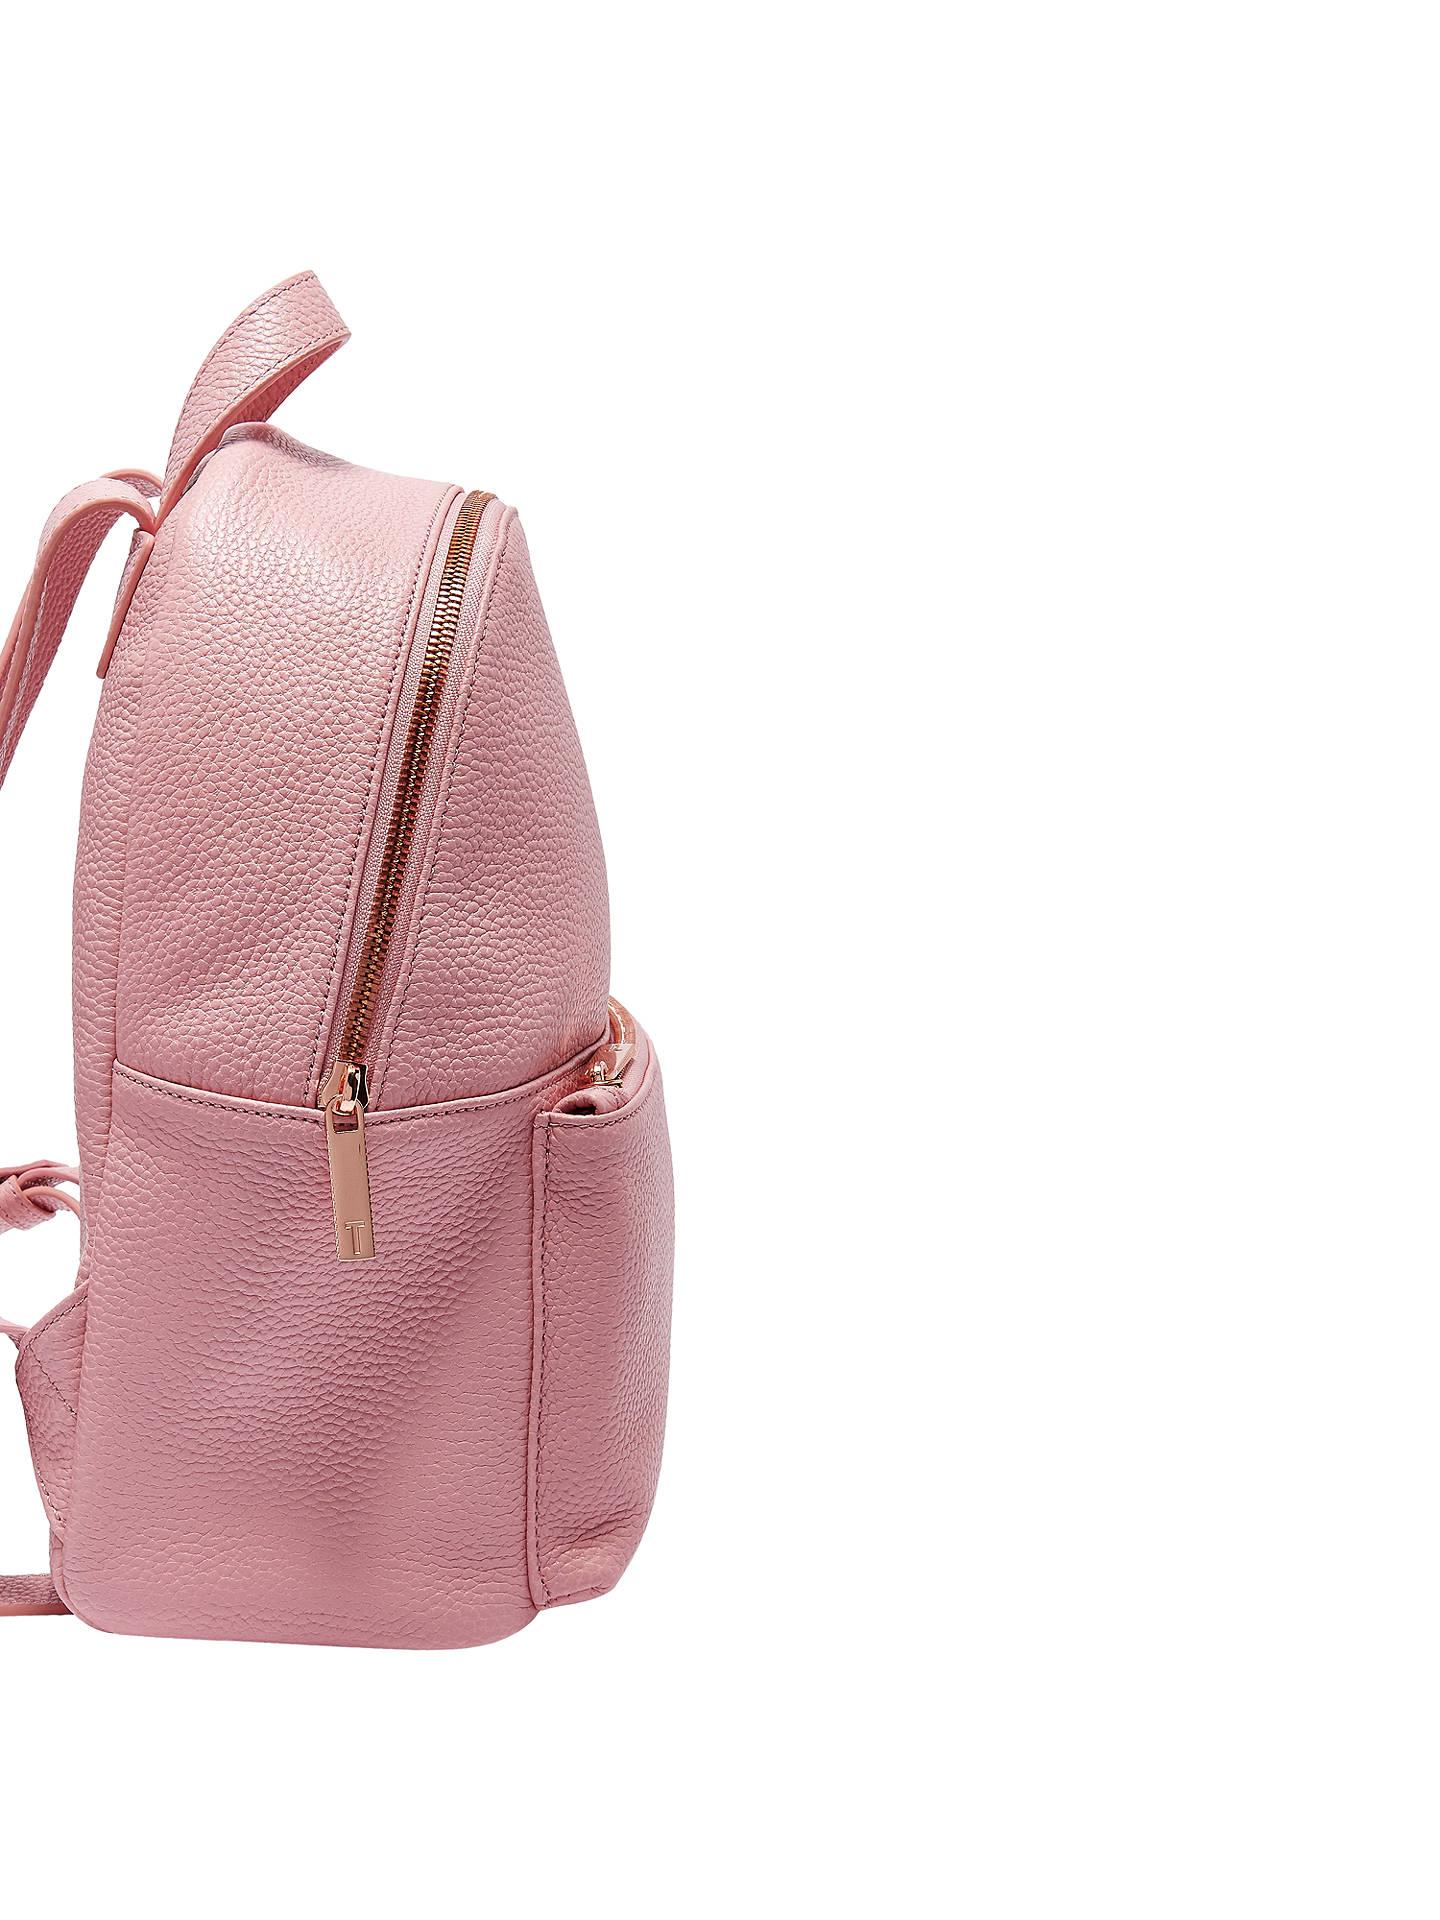 930f6fcd6 ... Buy Ted Baker Pearen Leather Backpack, Dusky Pink Online at  johnlewis.com